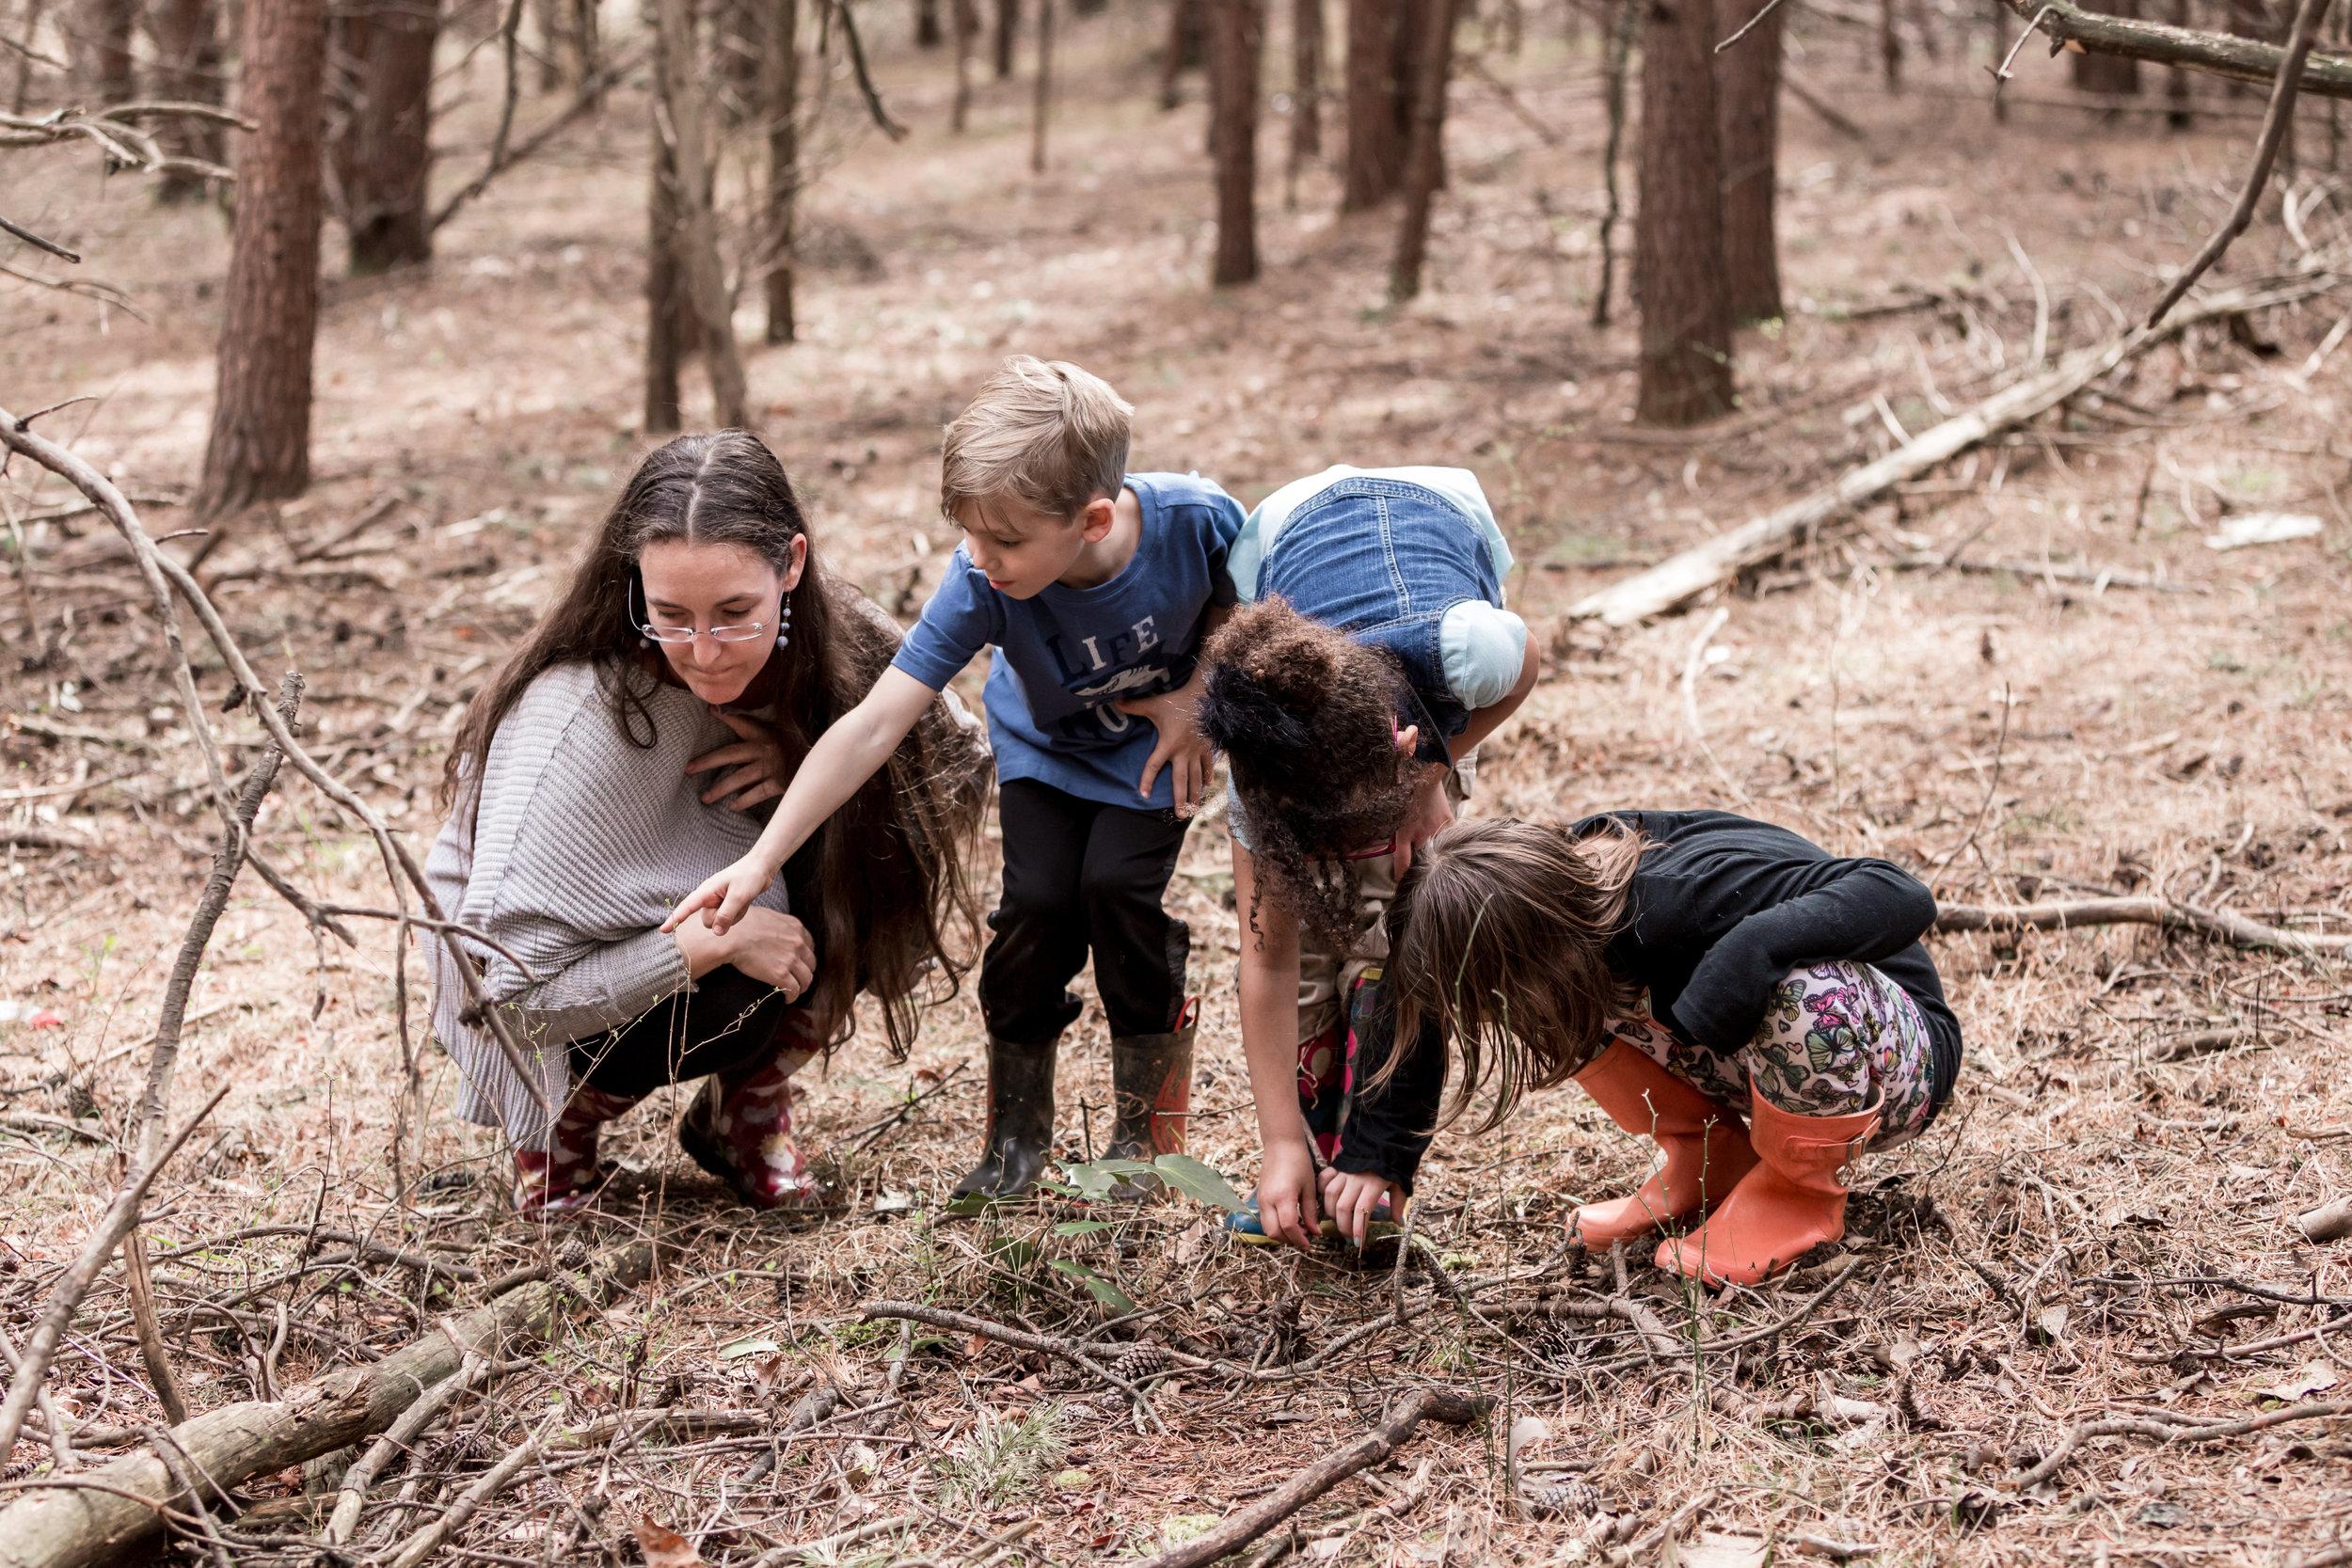 montessori_blue_ridge_forest_virginia_volunteer_children_school_liberty_university_lynchburg_college_randolph_education_lynchburg_internships